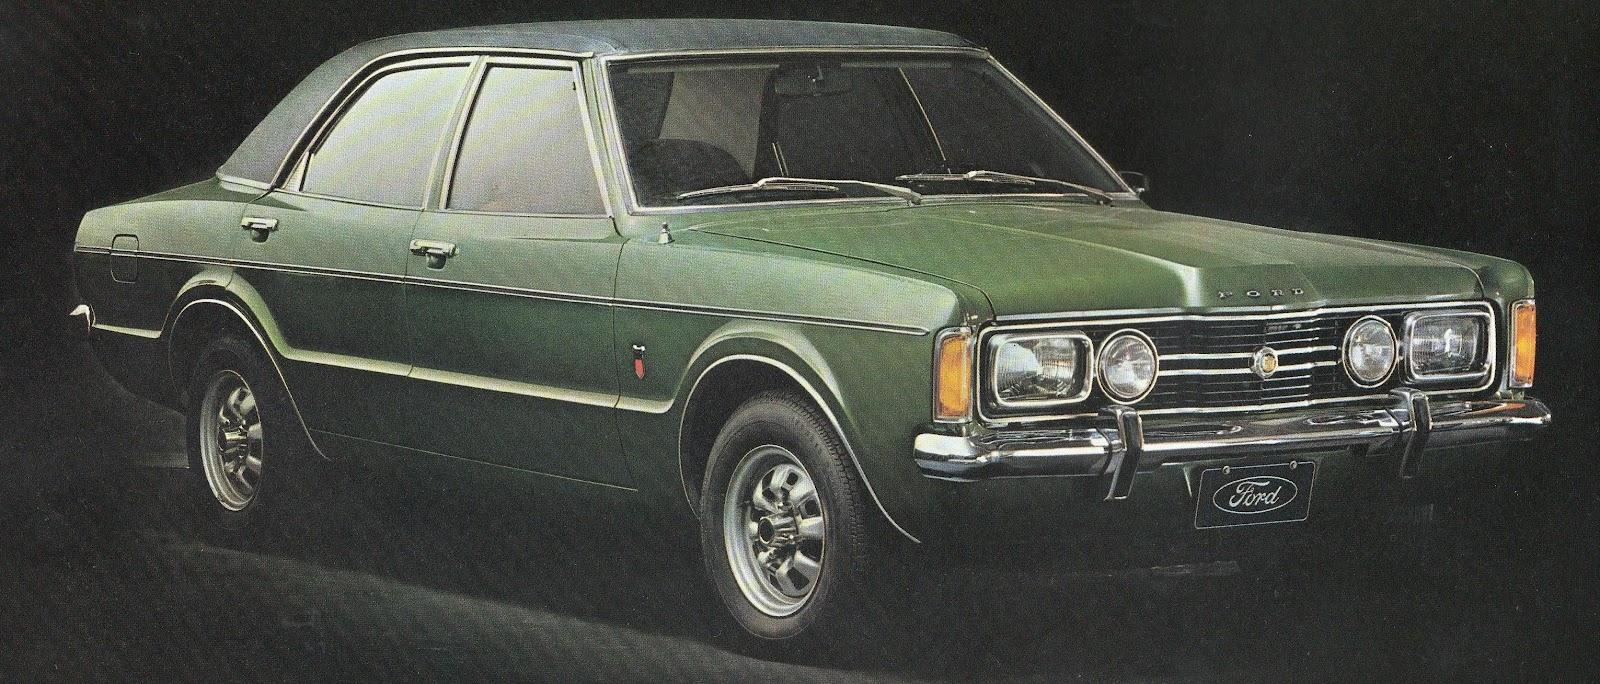 archivo de autos ford taunus gxl 1979. Black Bedroom Furniture Sets. Home Design Ideas